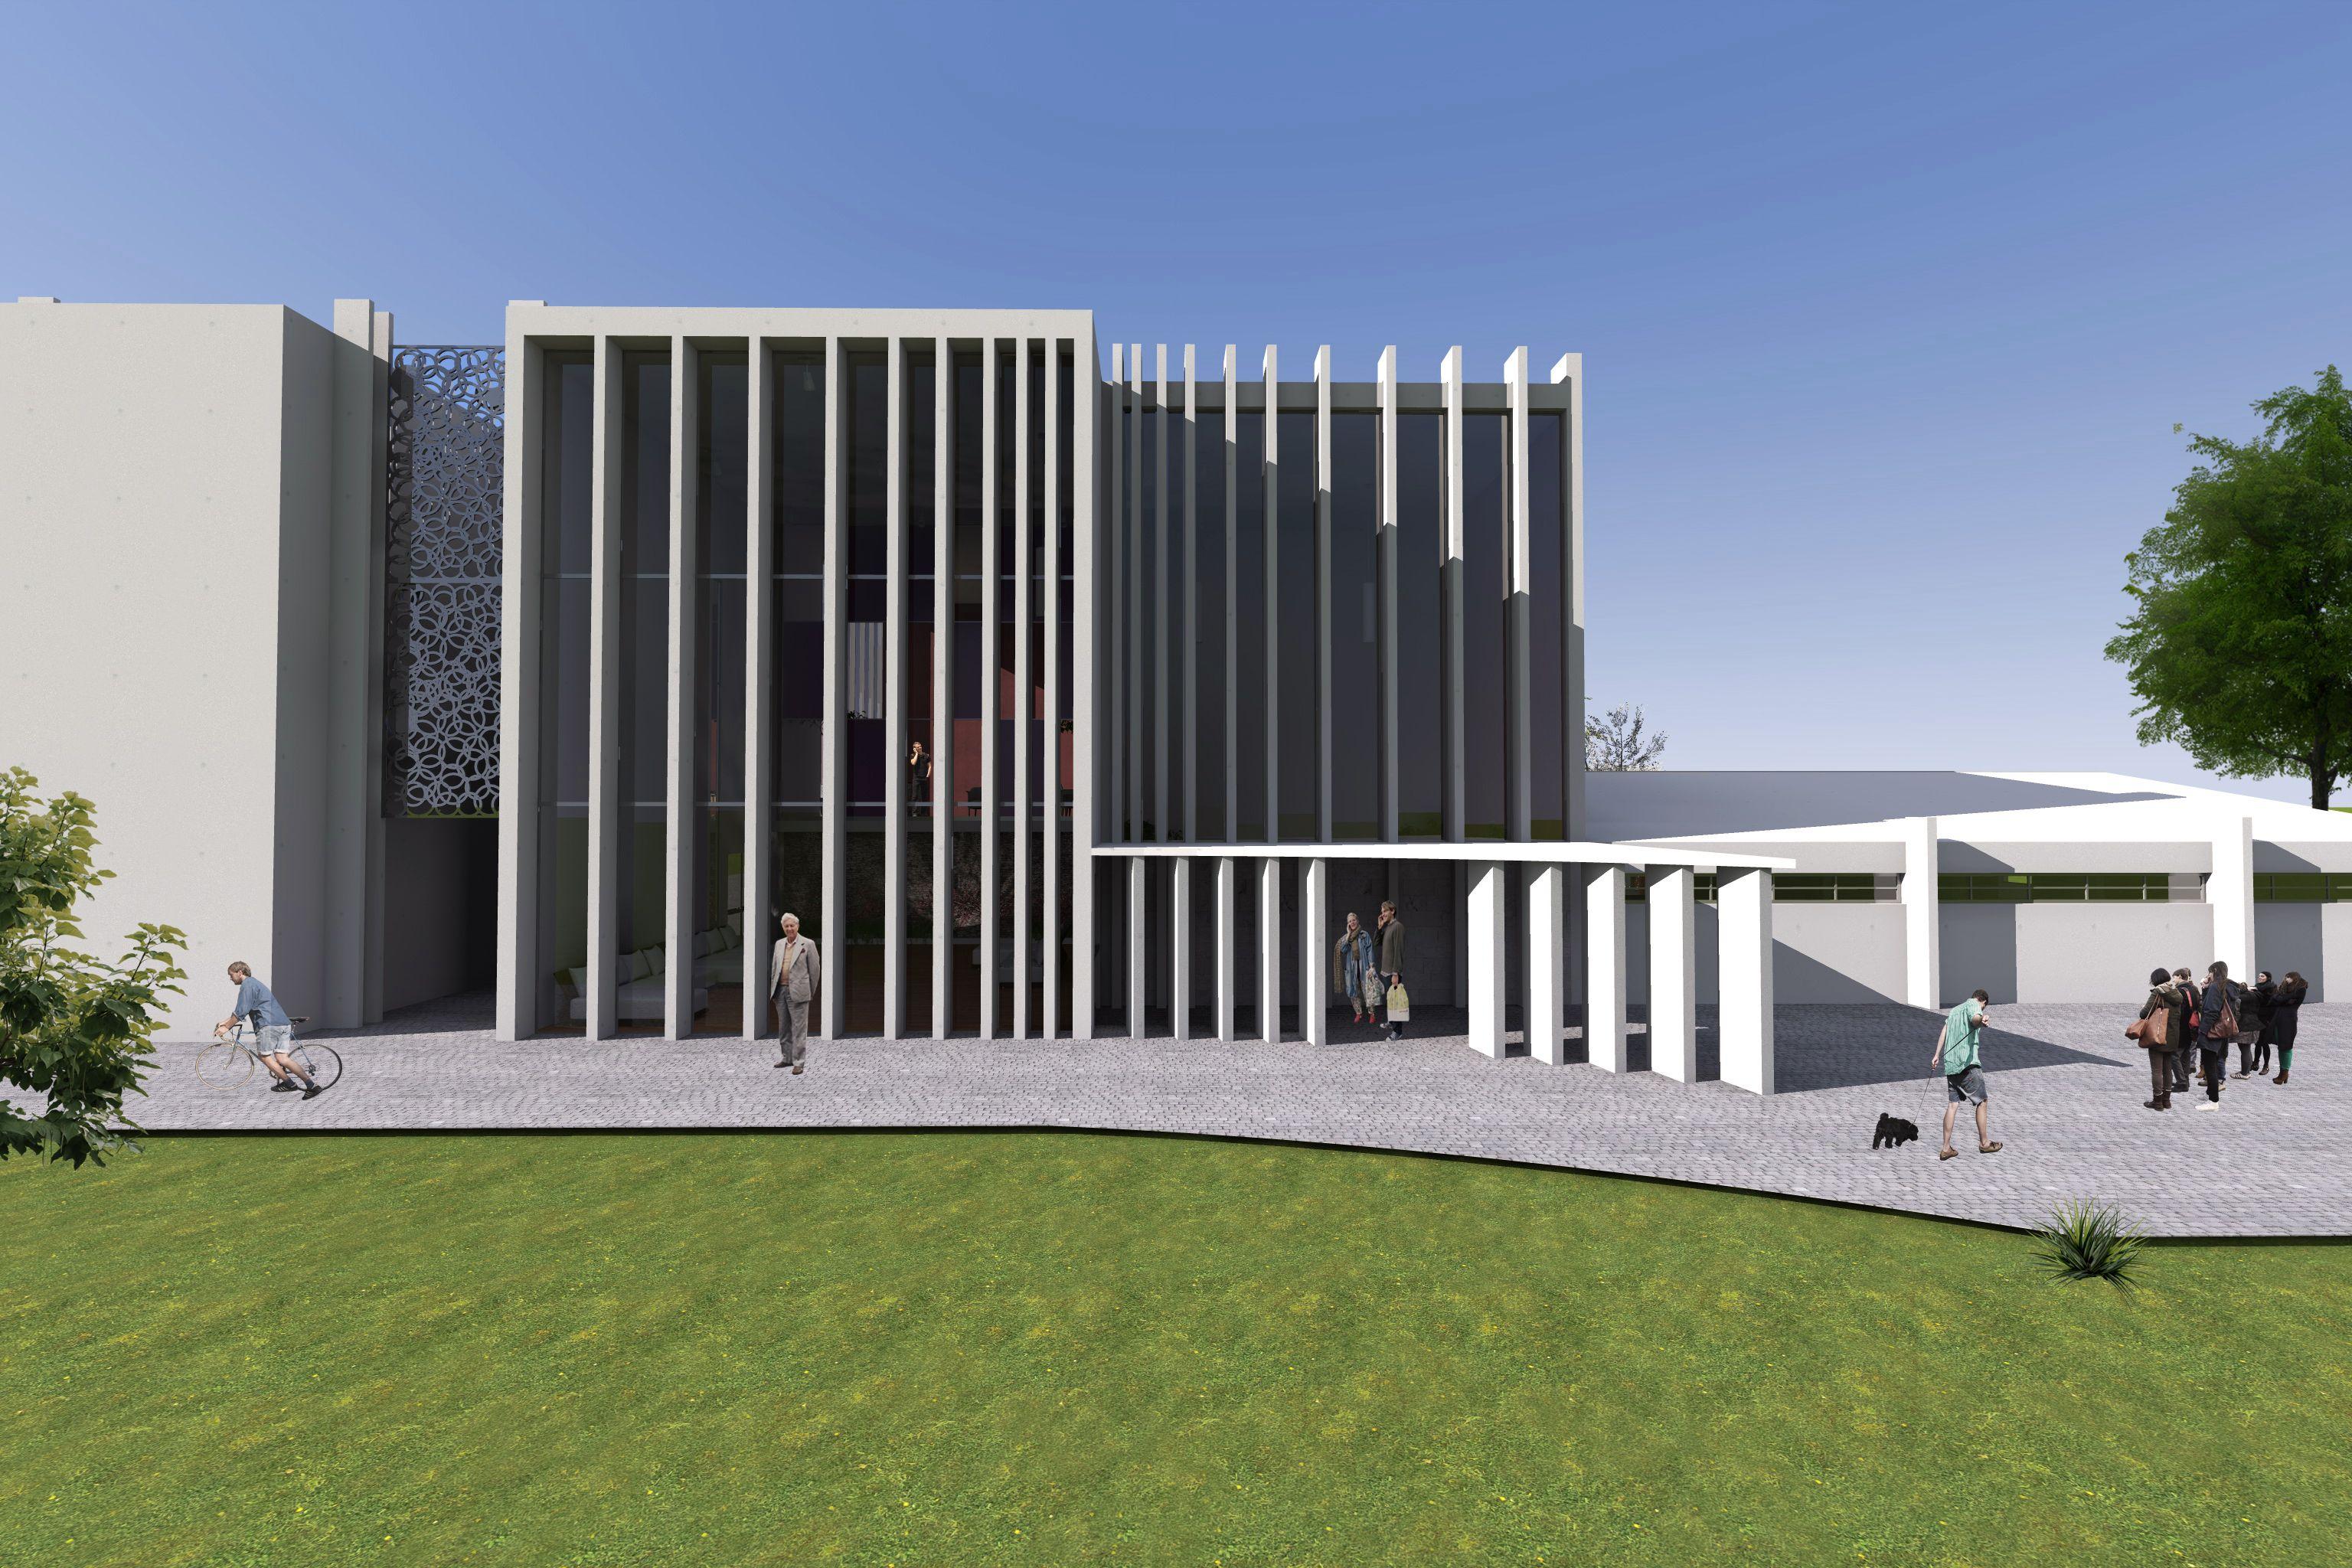 Favoritos Render arquitectónico- Asilo de ancianos | Arquitectura para  BM71